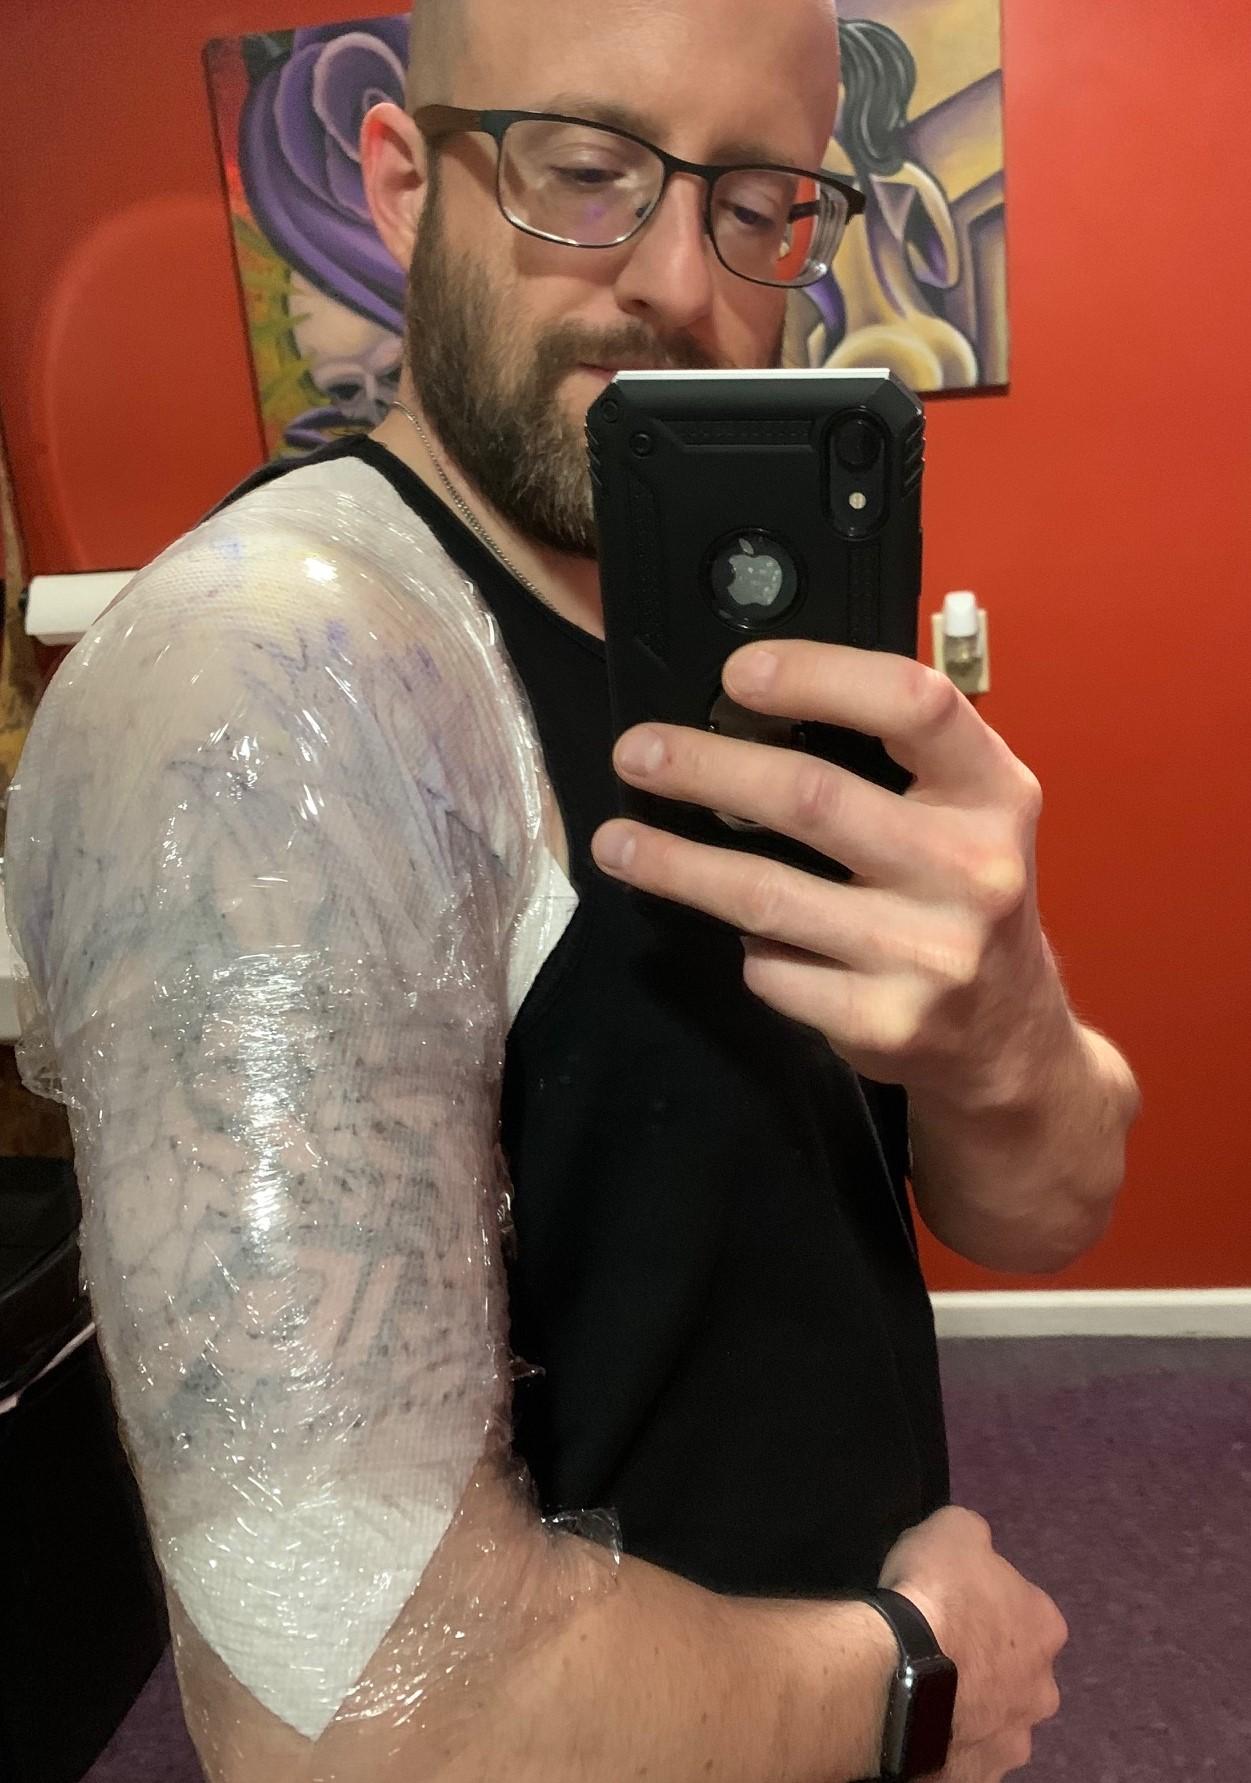 Bactine wrap